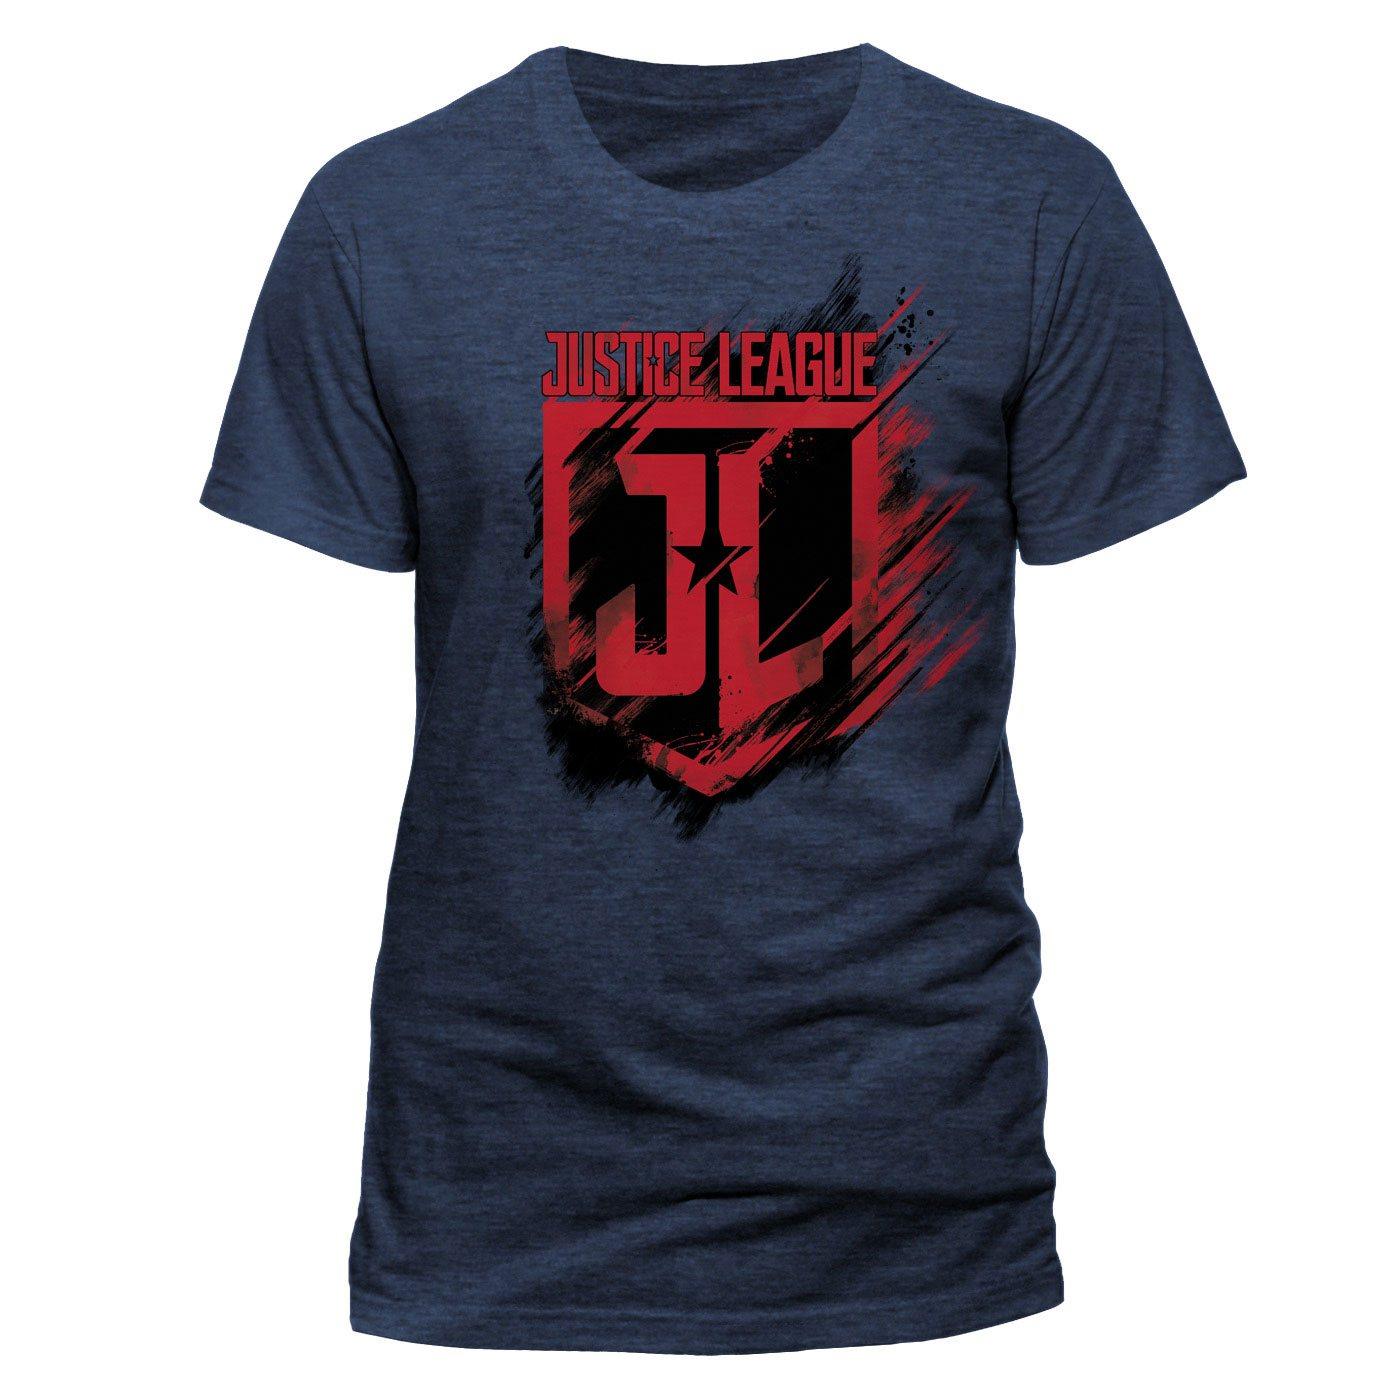 Justice League Movie T-Shirt Shield Size XL